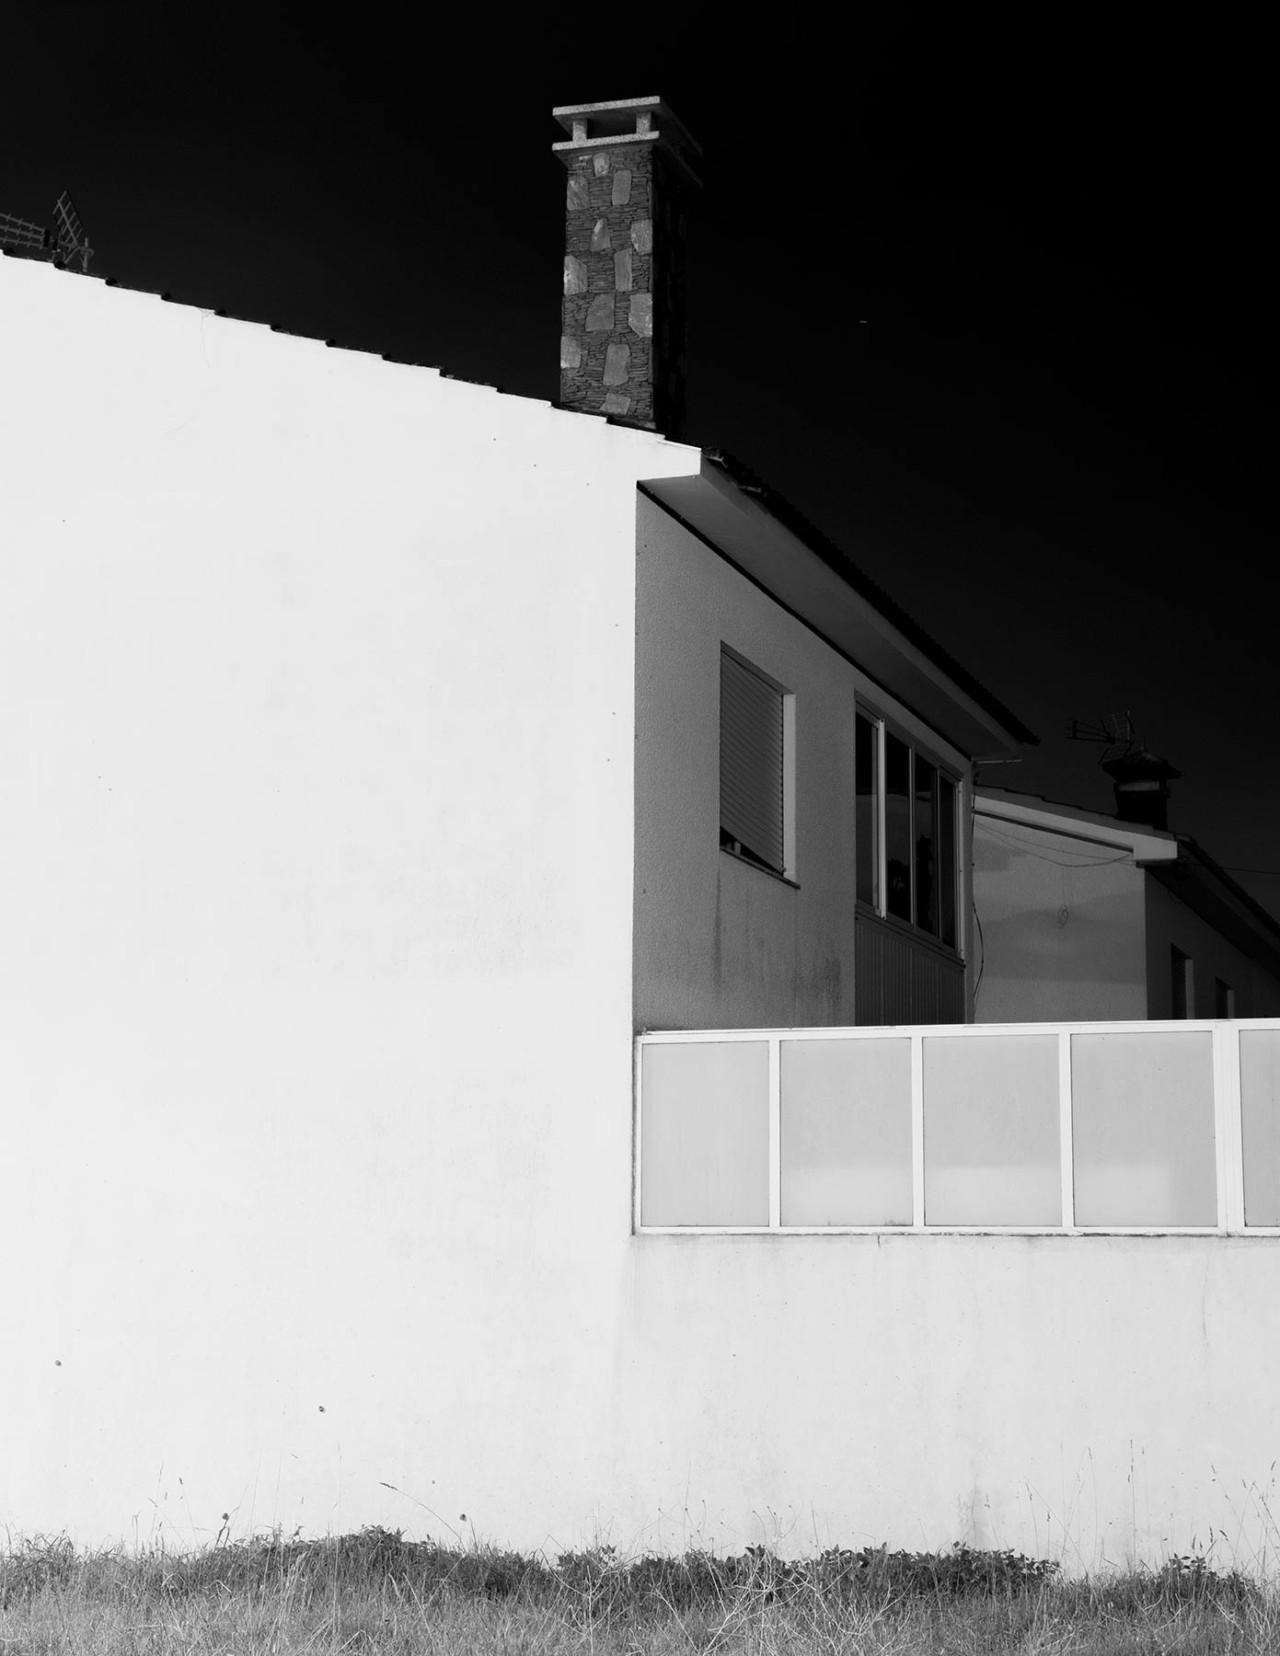 Continu-um; a photographic duo. 3. October 2016